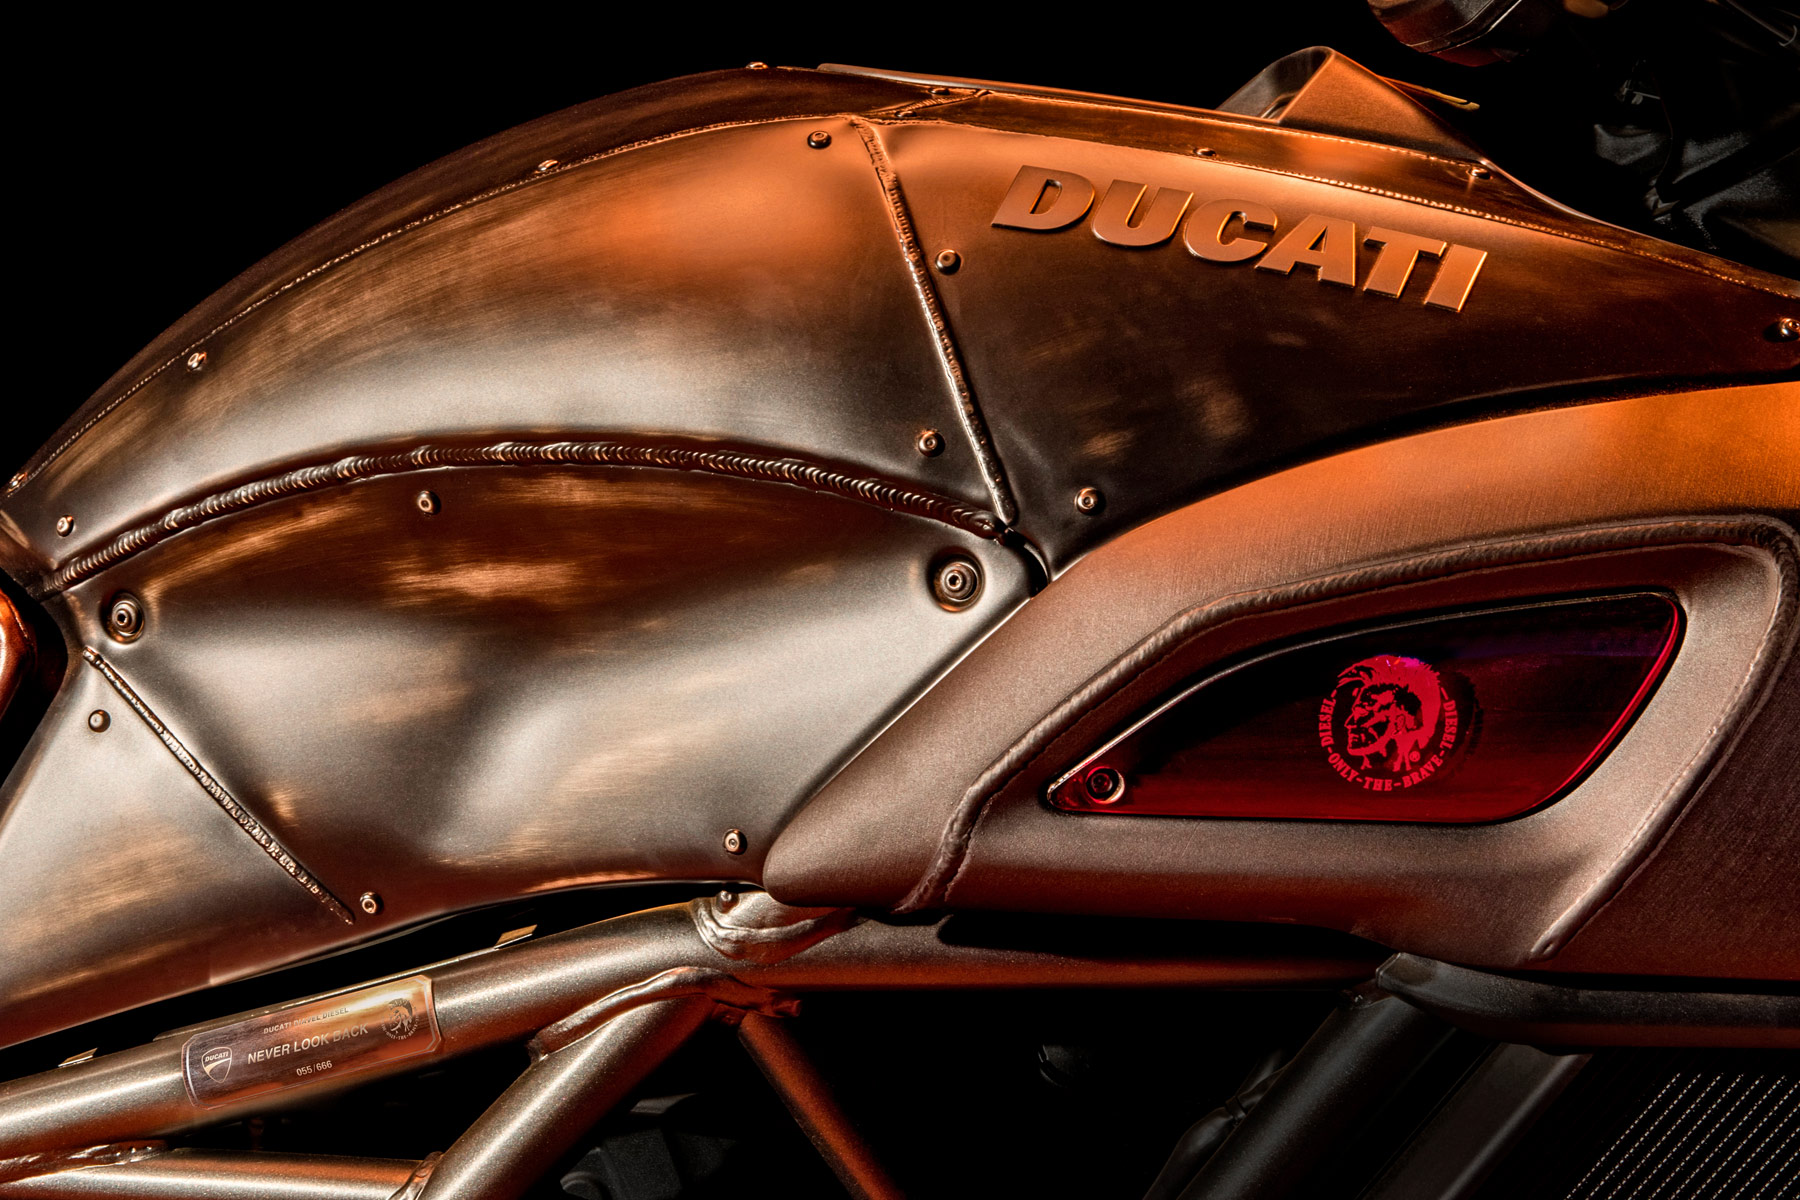 The Ducati Diavel Diesel – 'Bellezza' On Two Wheels